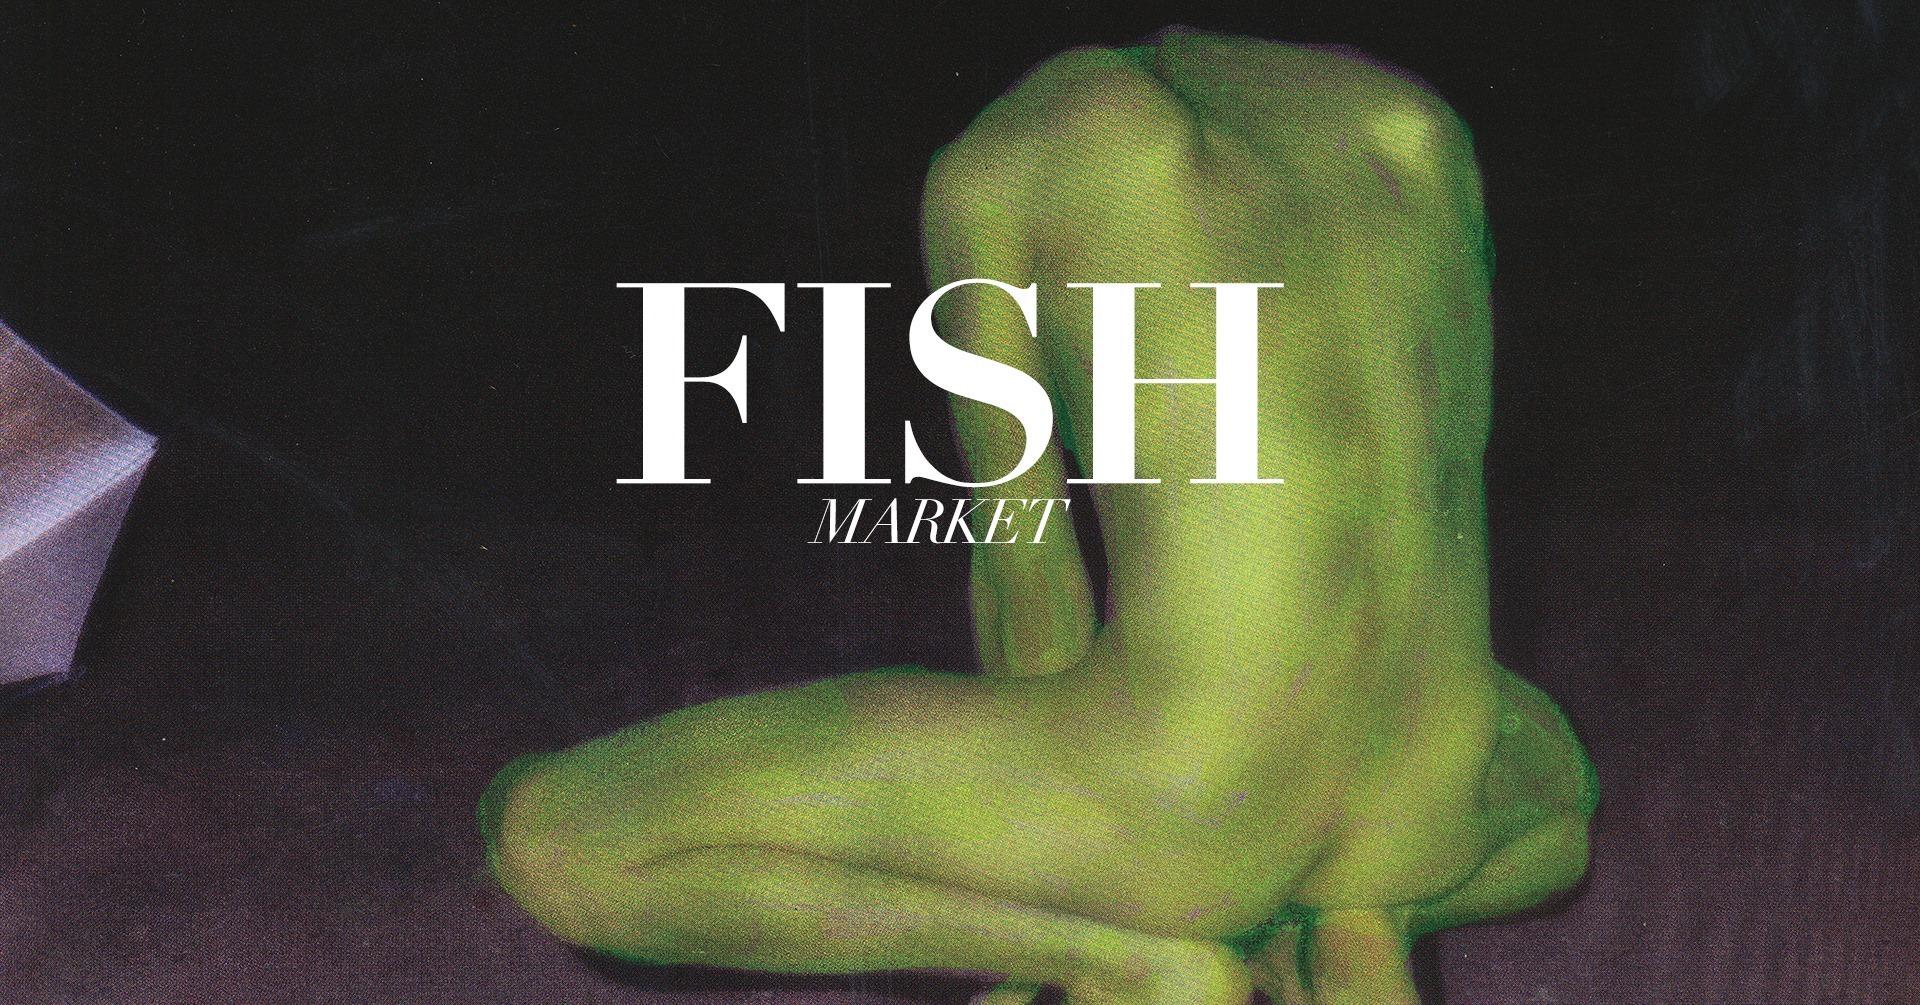 Events Wien: FISH MARKET w/ Cleric (UK)